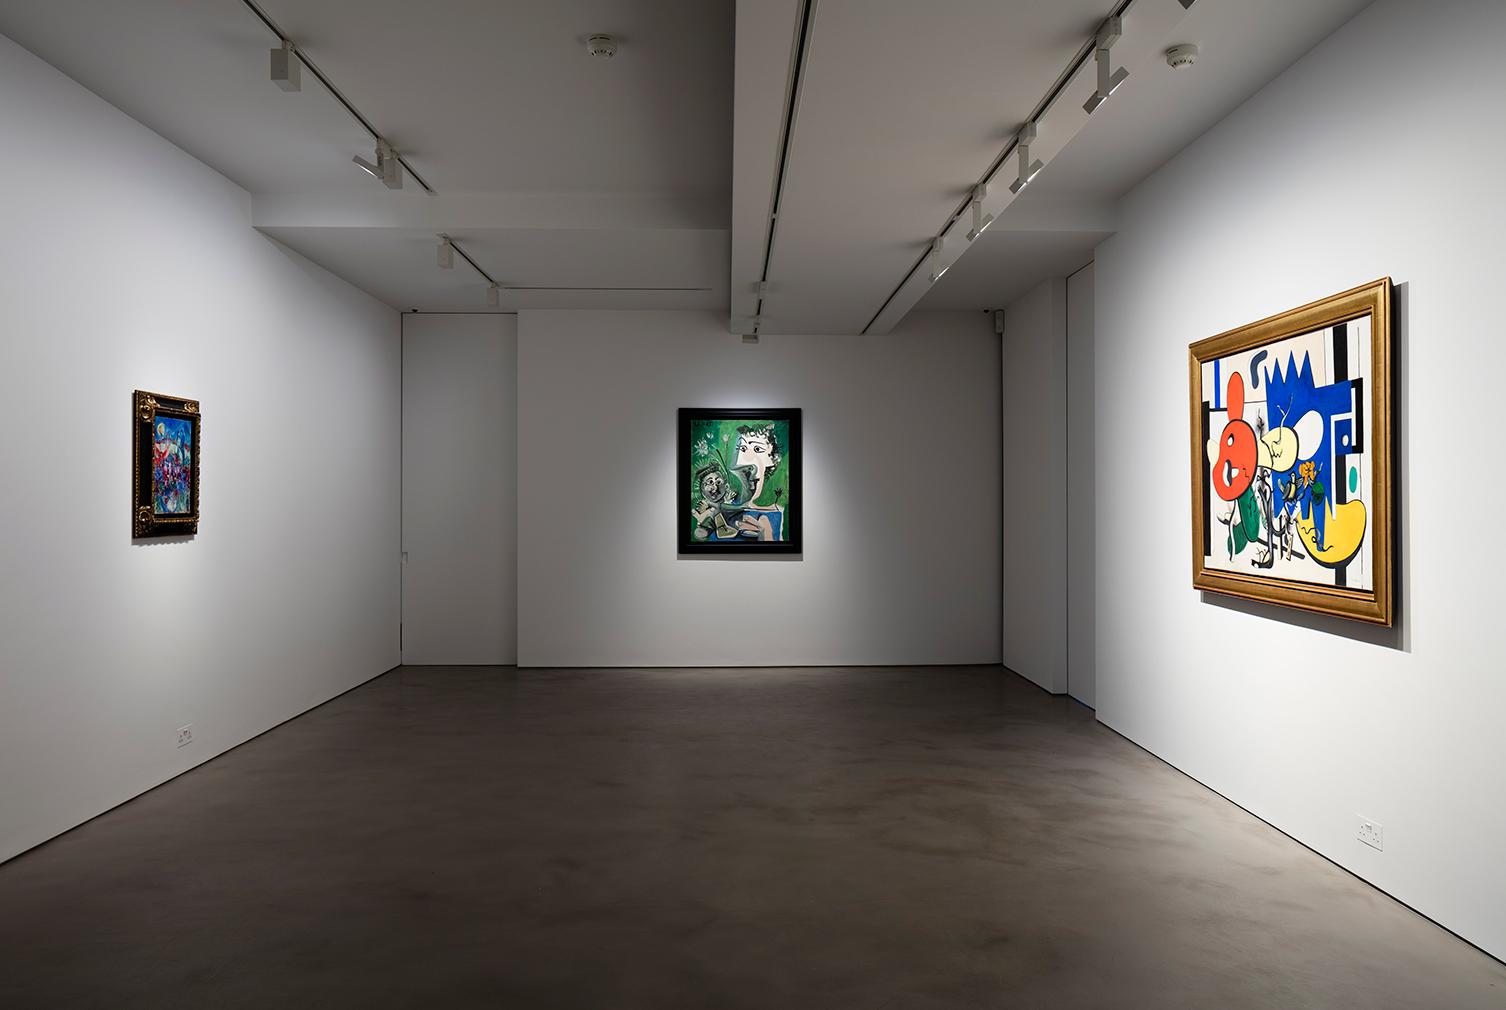 malingue-gallery-installation-shot-3